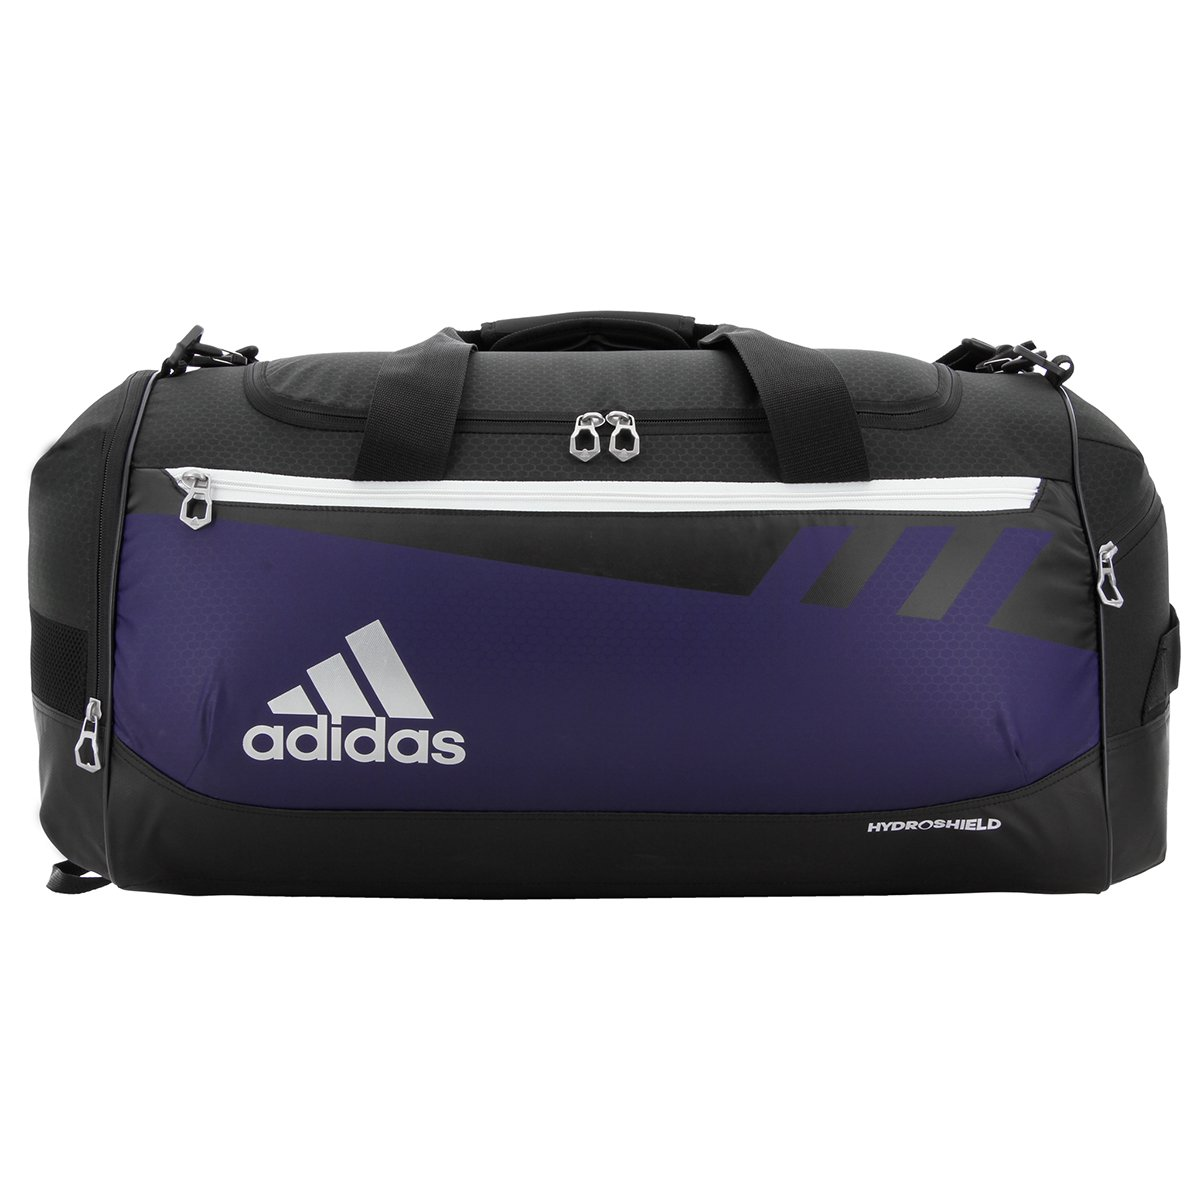 Adidas Sporttasche, Sporttasche, Sporttasche, Team-Kollektion B013Q4QDB6 Klassische Sporttaschen Modern ef165a